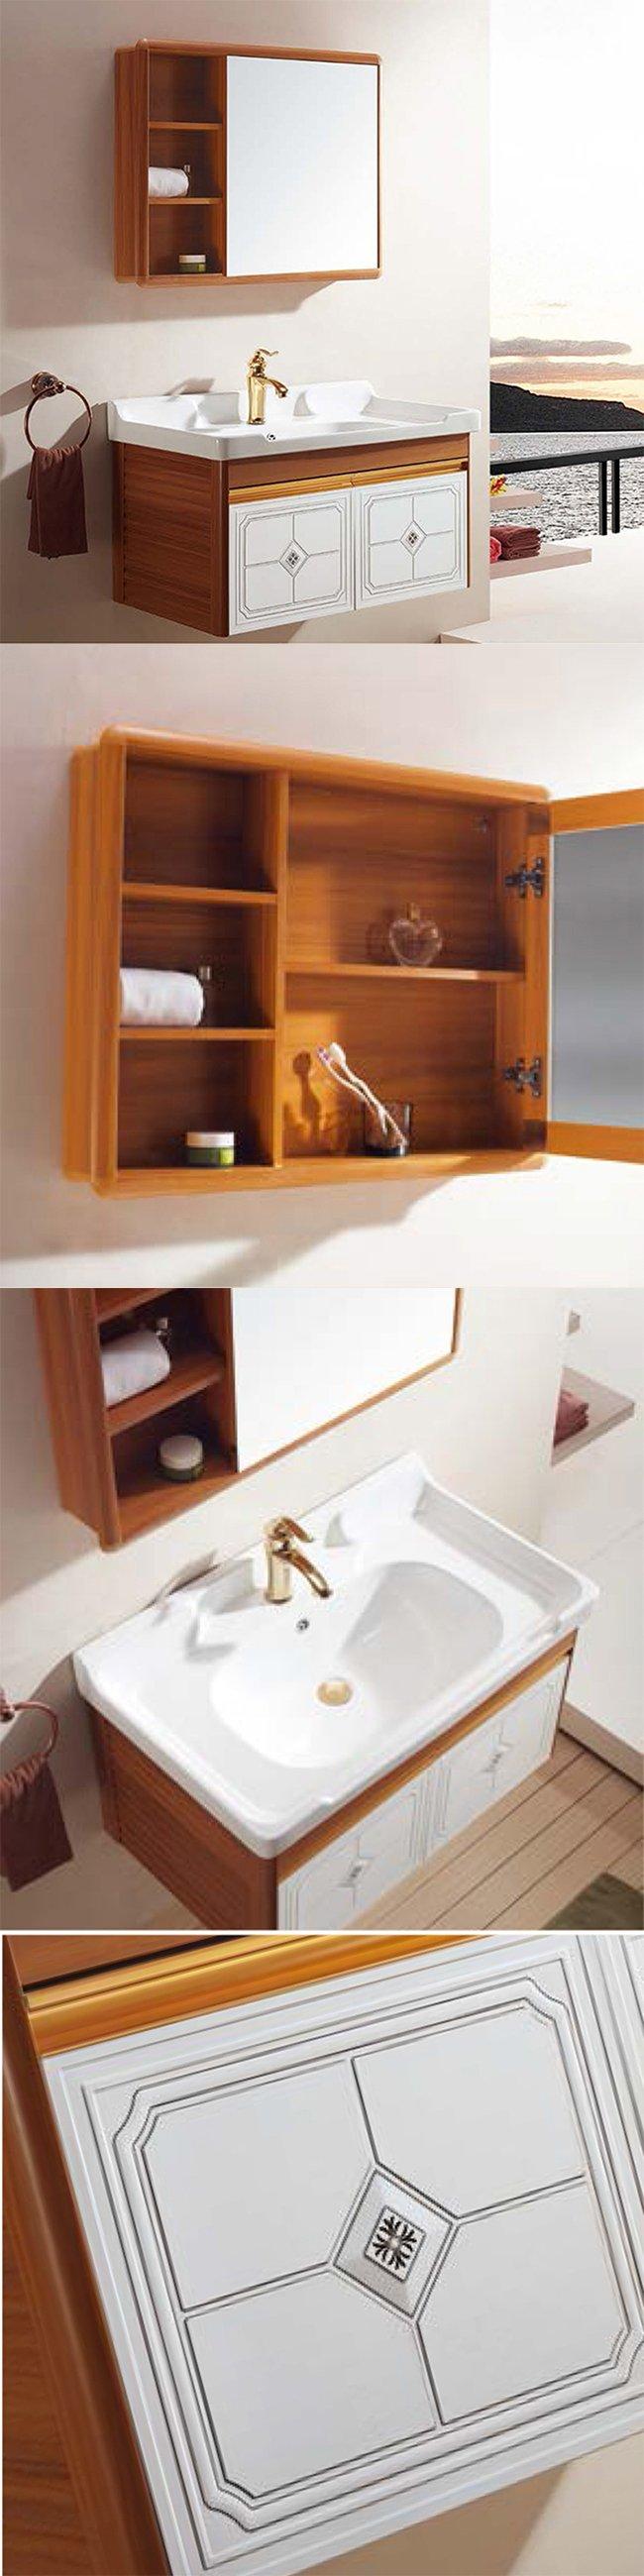 European Style Antique Bathroom Cabinet